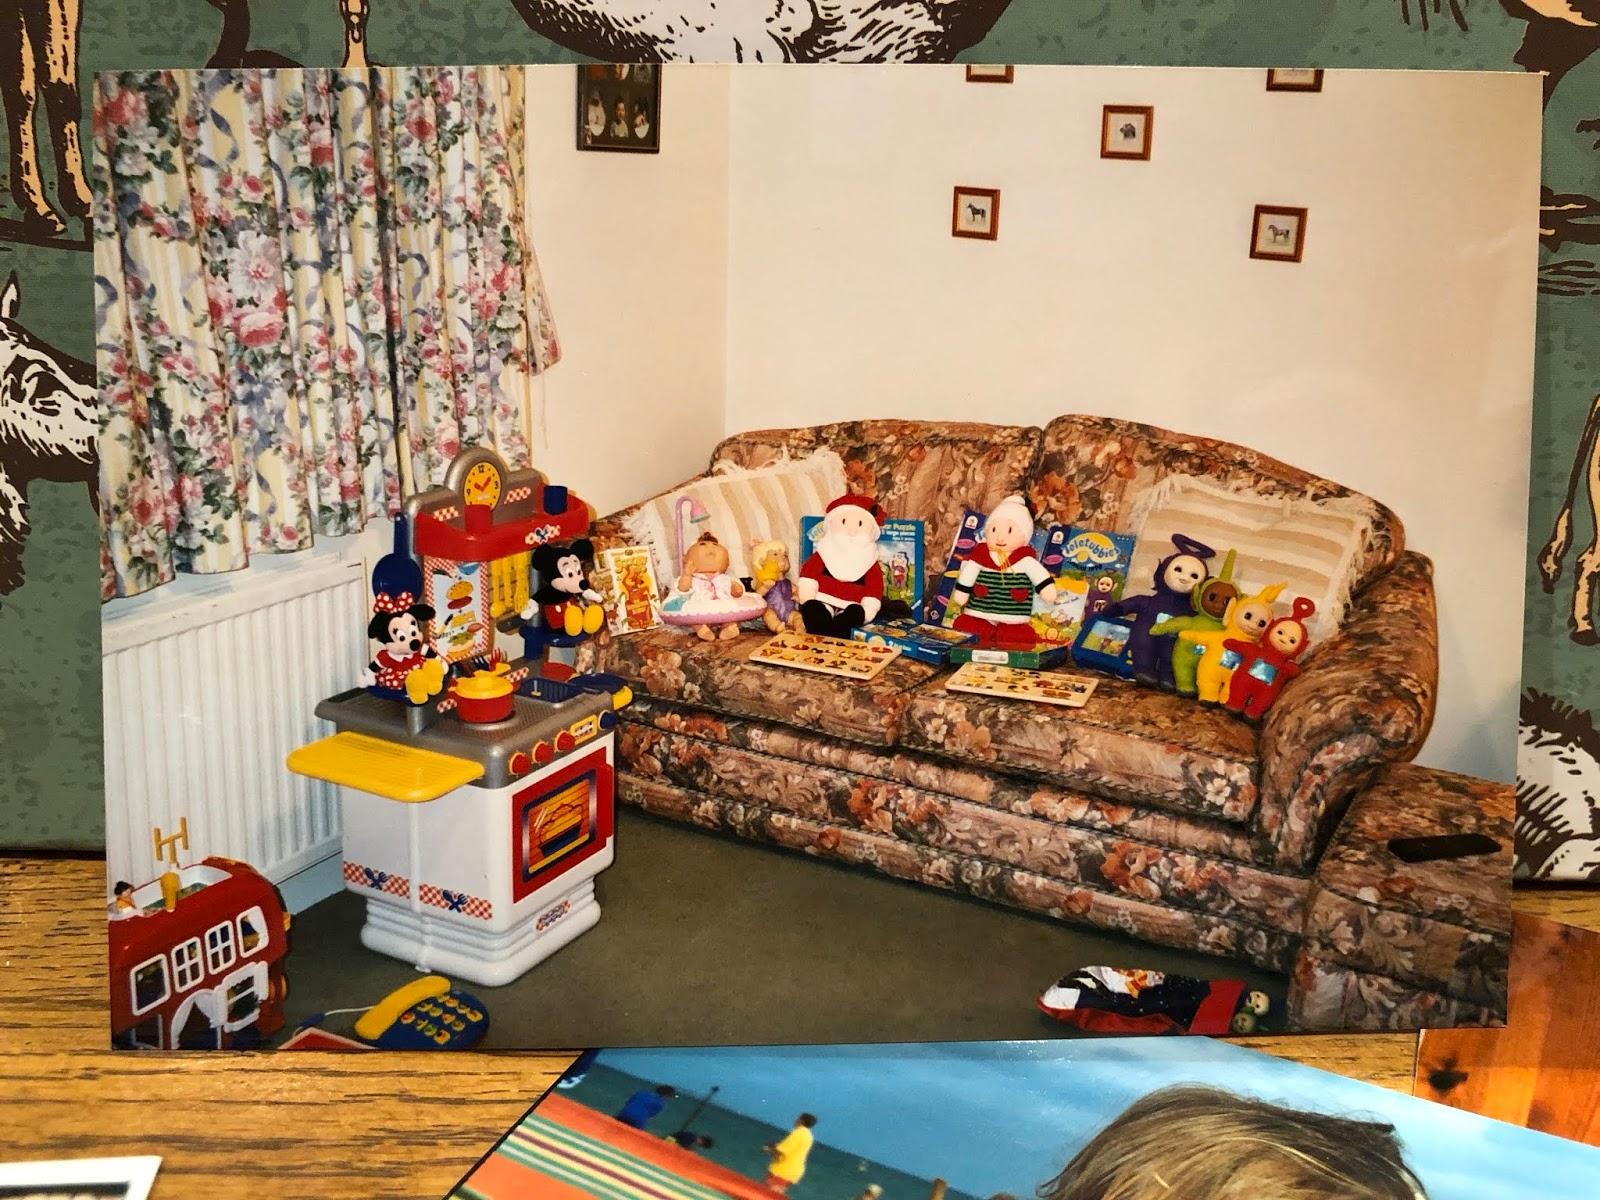 Blogmas Day 6: Favourite Childhood Christmas Memory